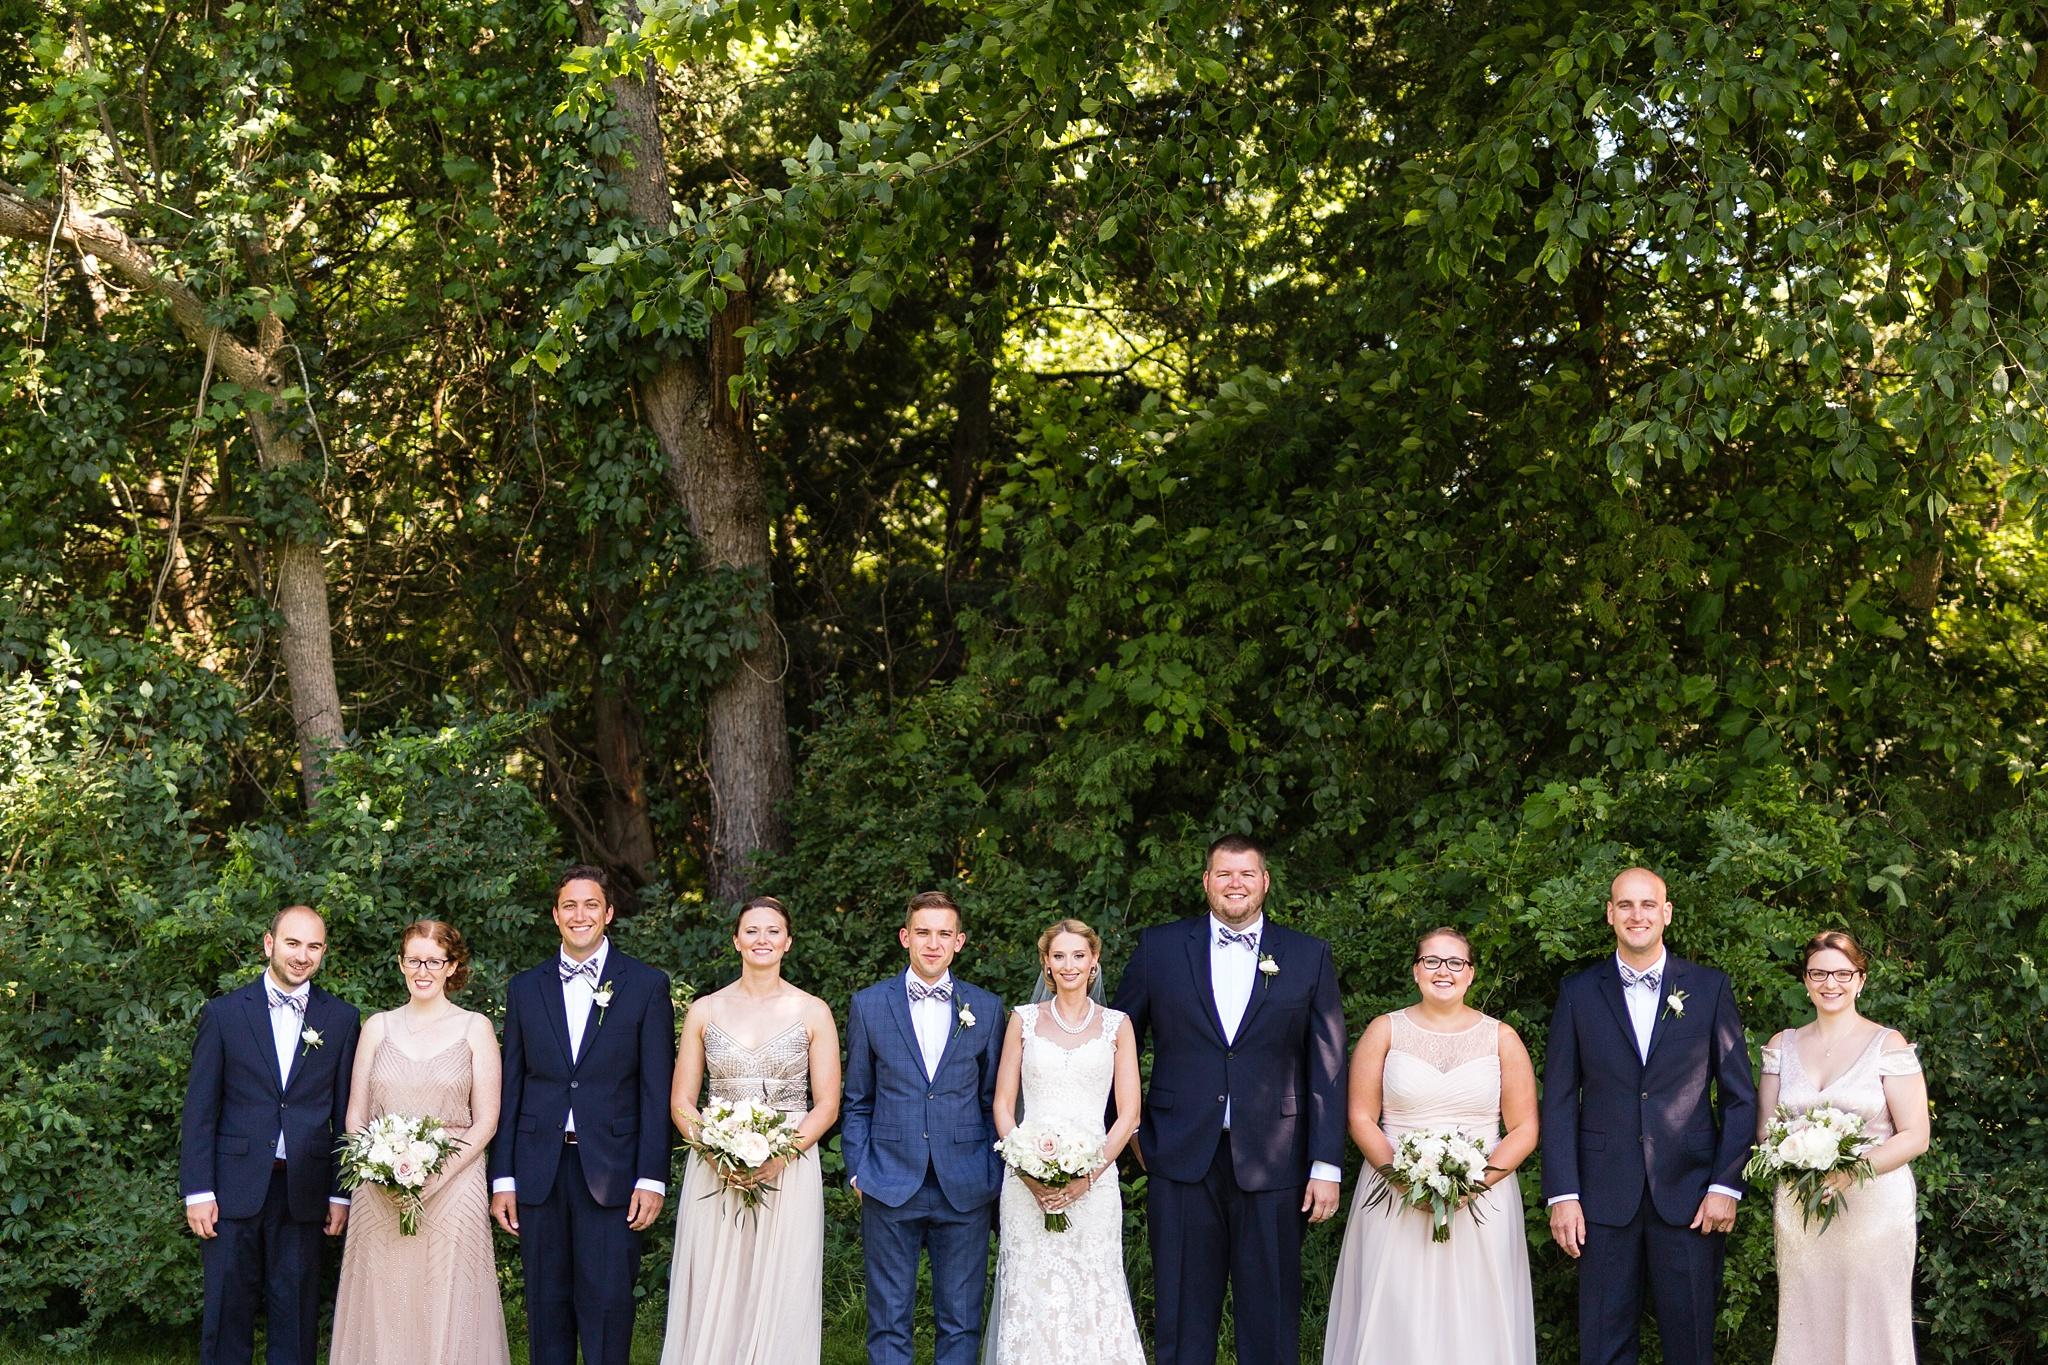 Becky_Cameron_Grand_Rapids_Blythefield Country_Club_Wedding028.JPG